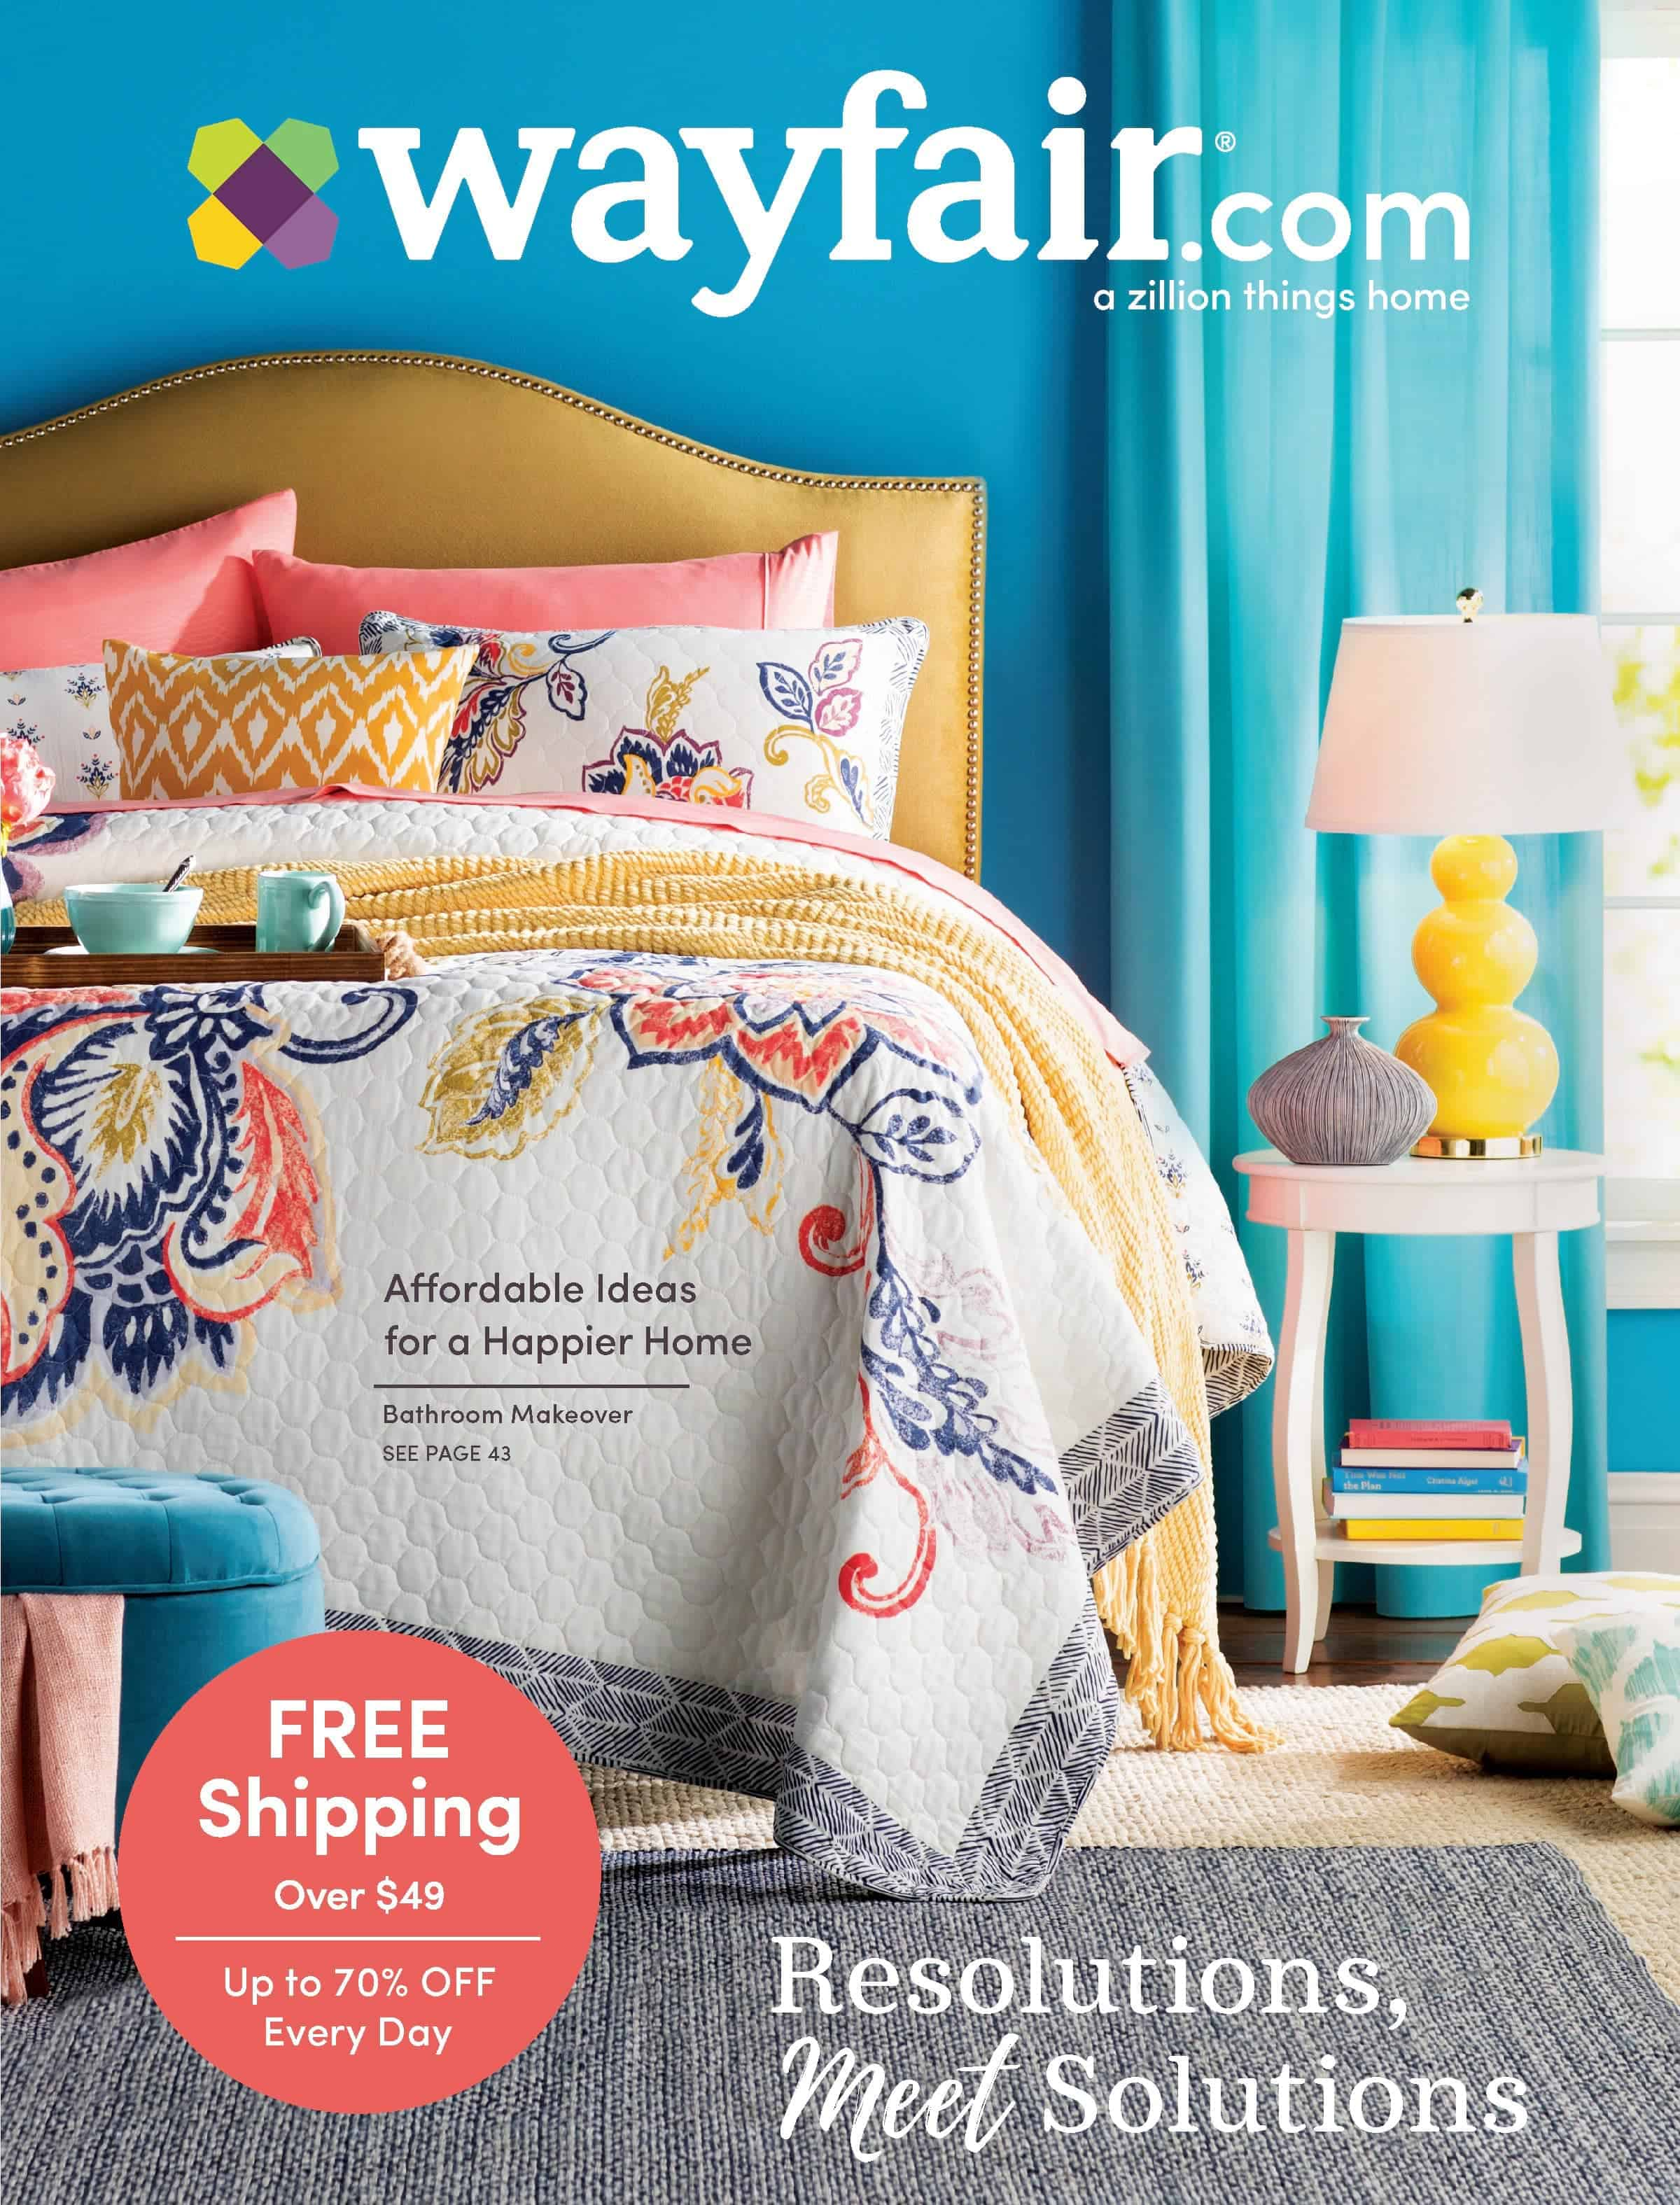 Wayfair catalog cover